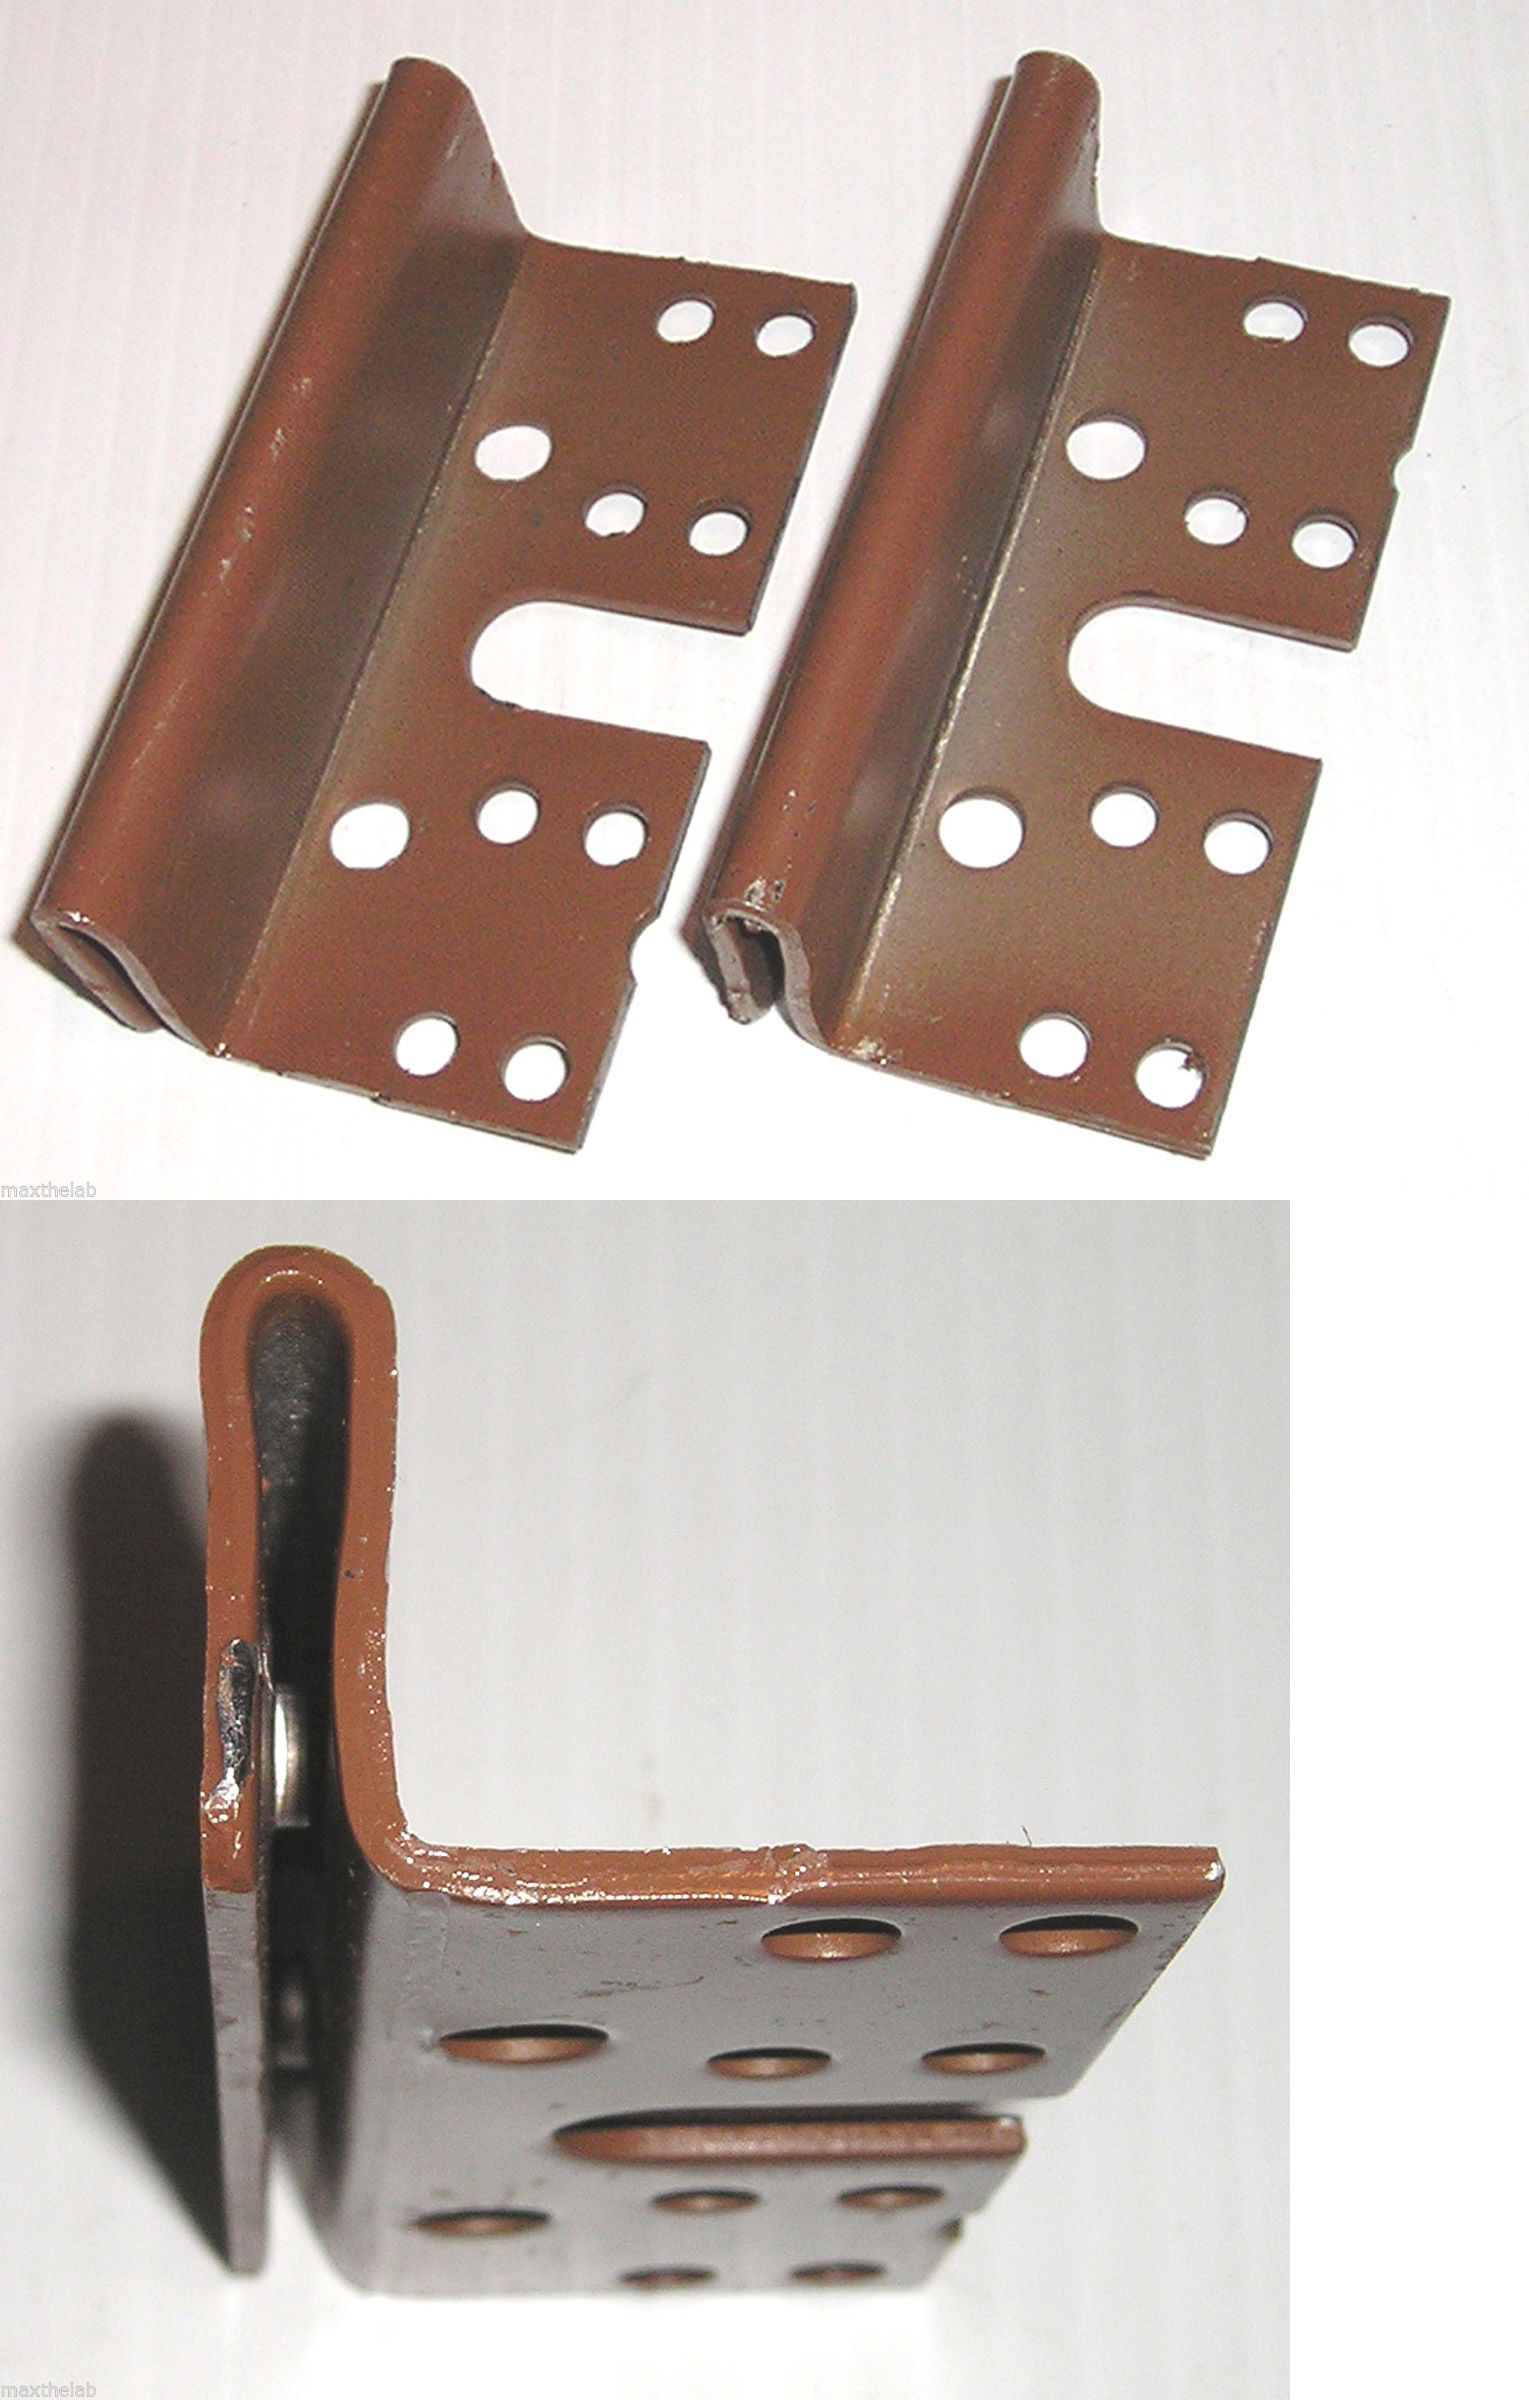 Bed Post Bracket (2 Pack) For 2 Hook Slot Bed Rail Plates